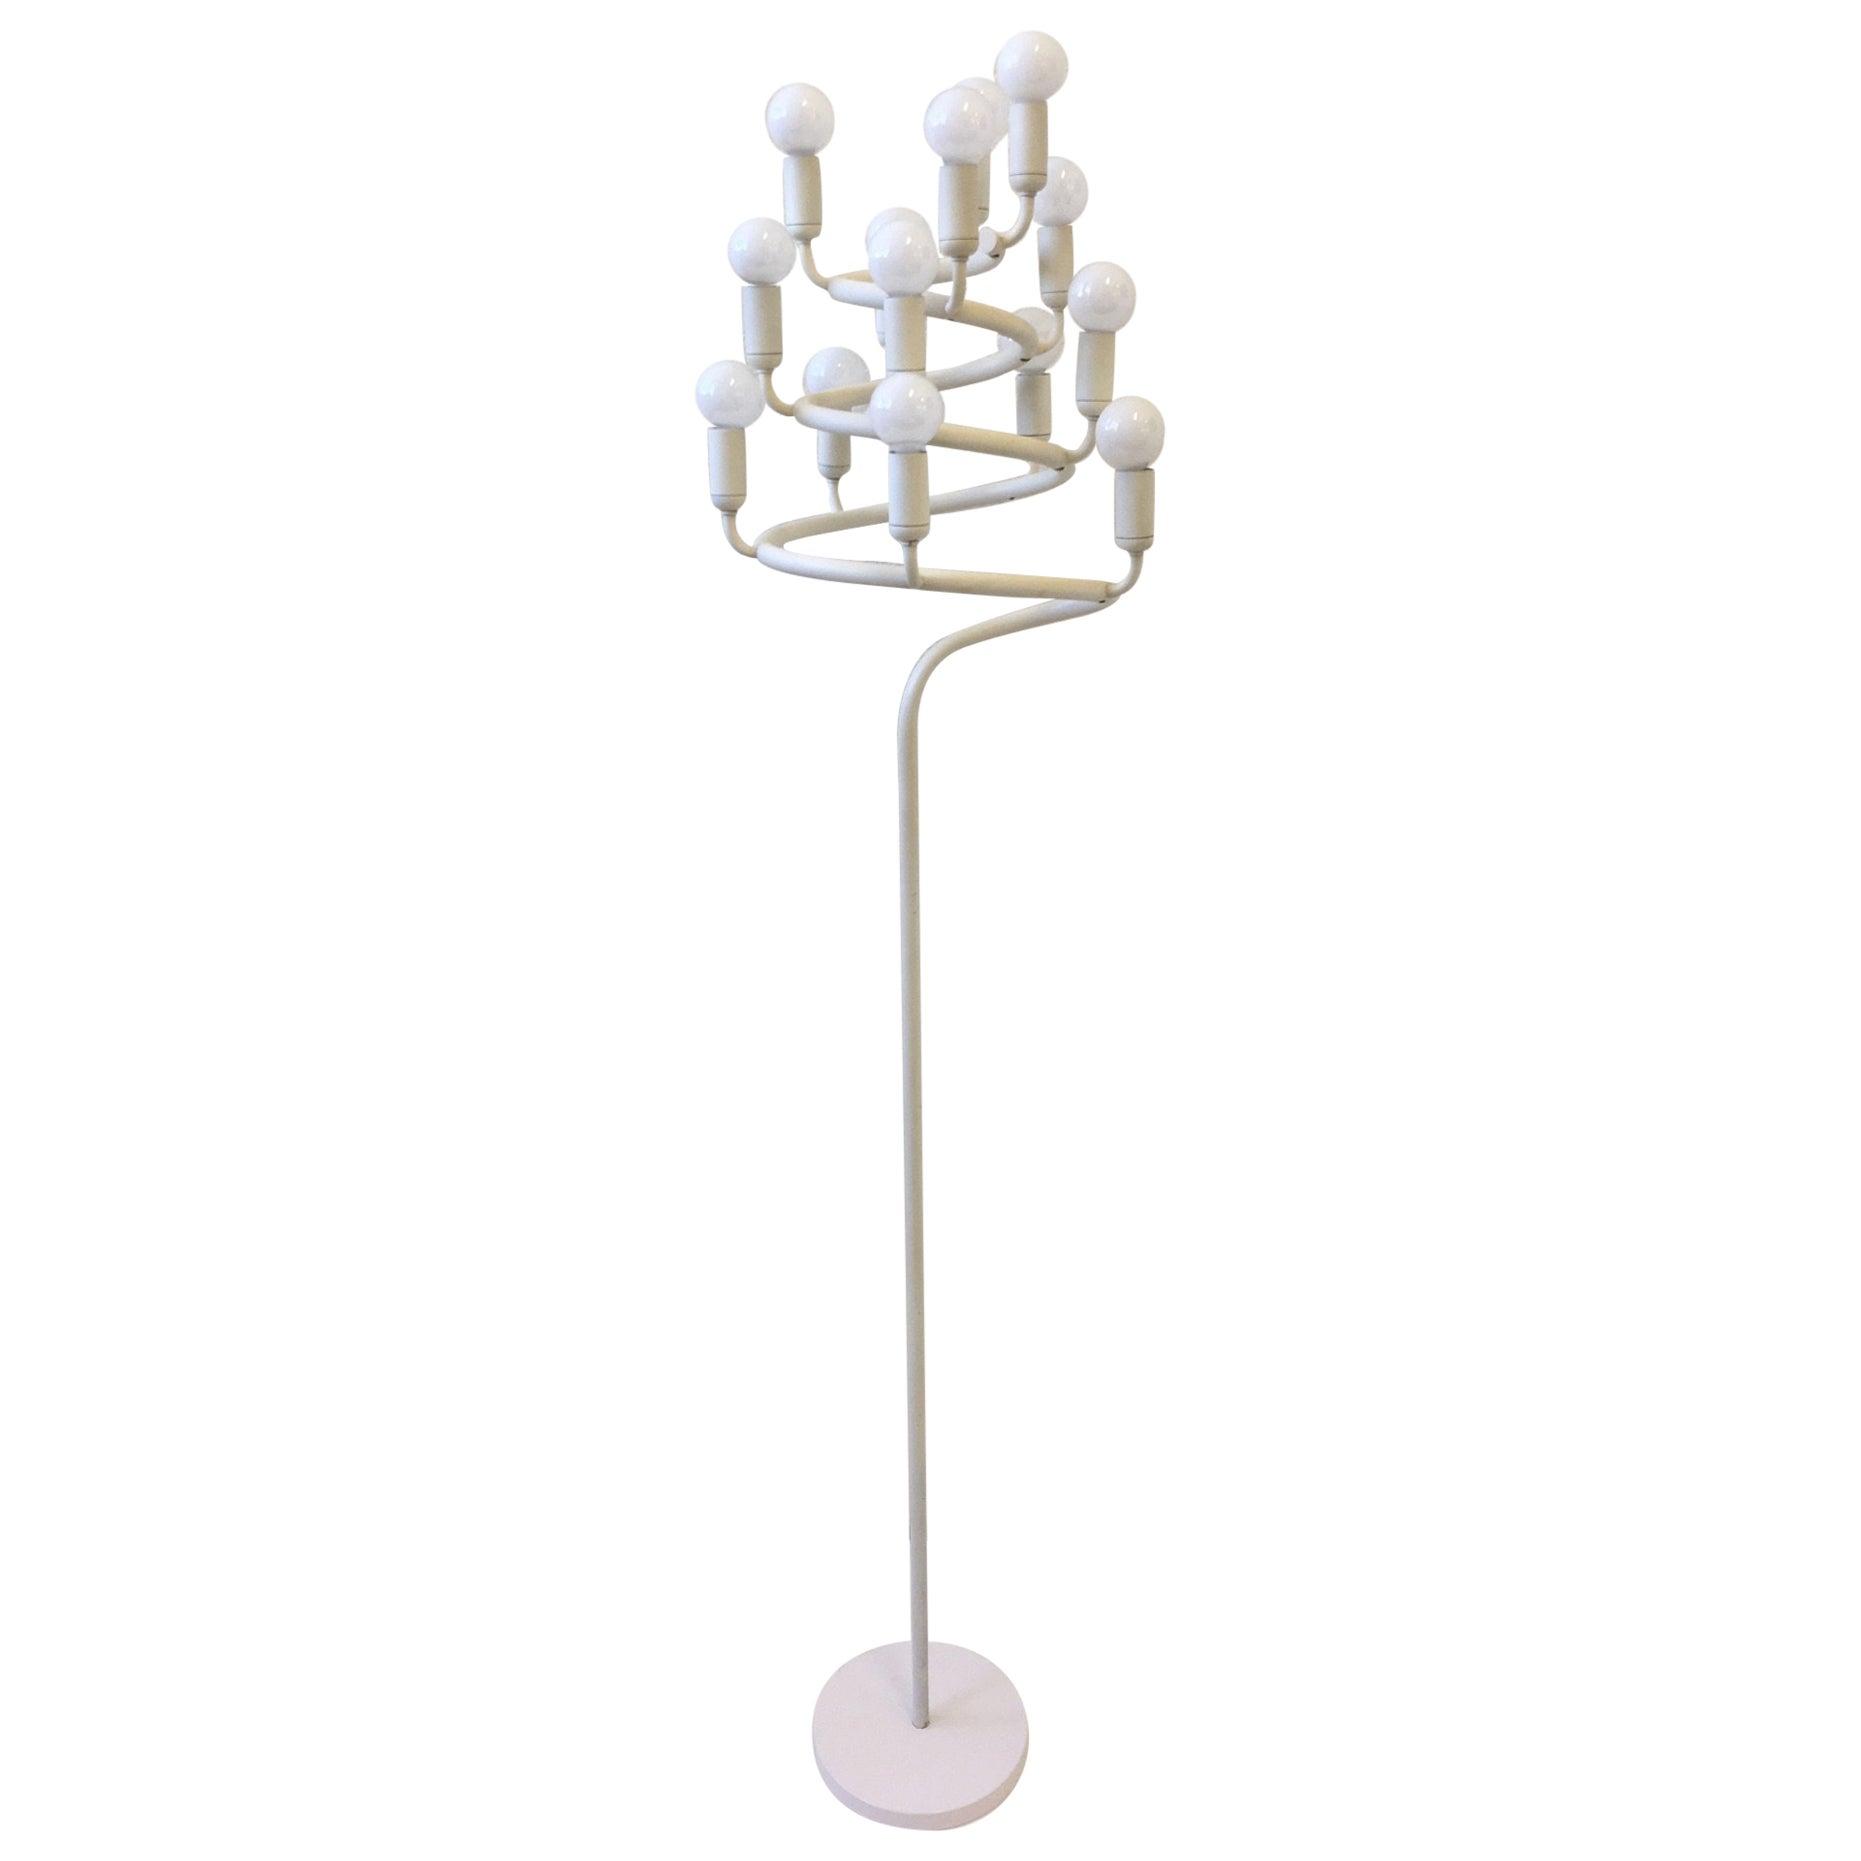 Spiral Candelabra Floor Lamp by Laurel